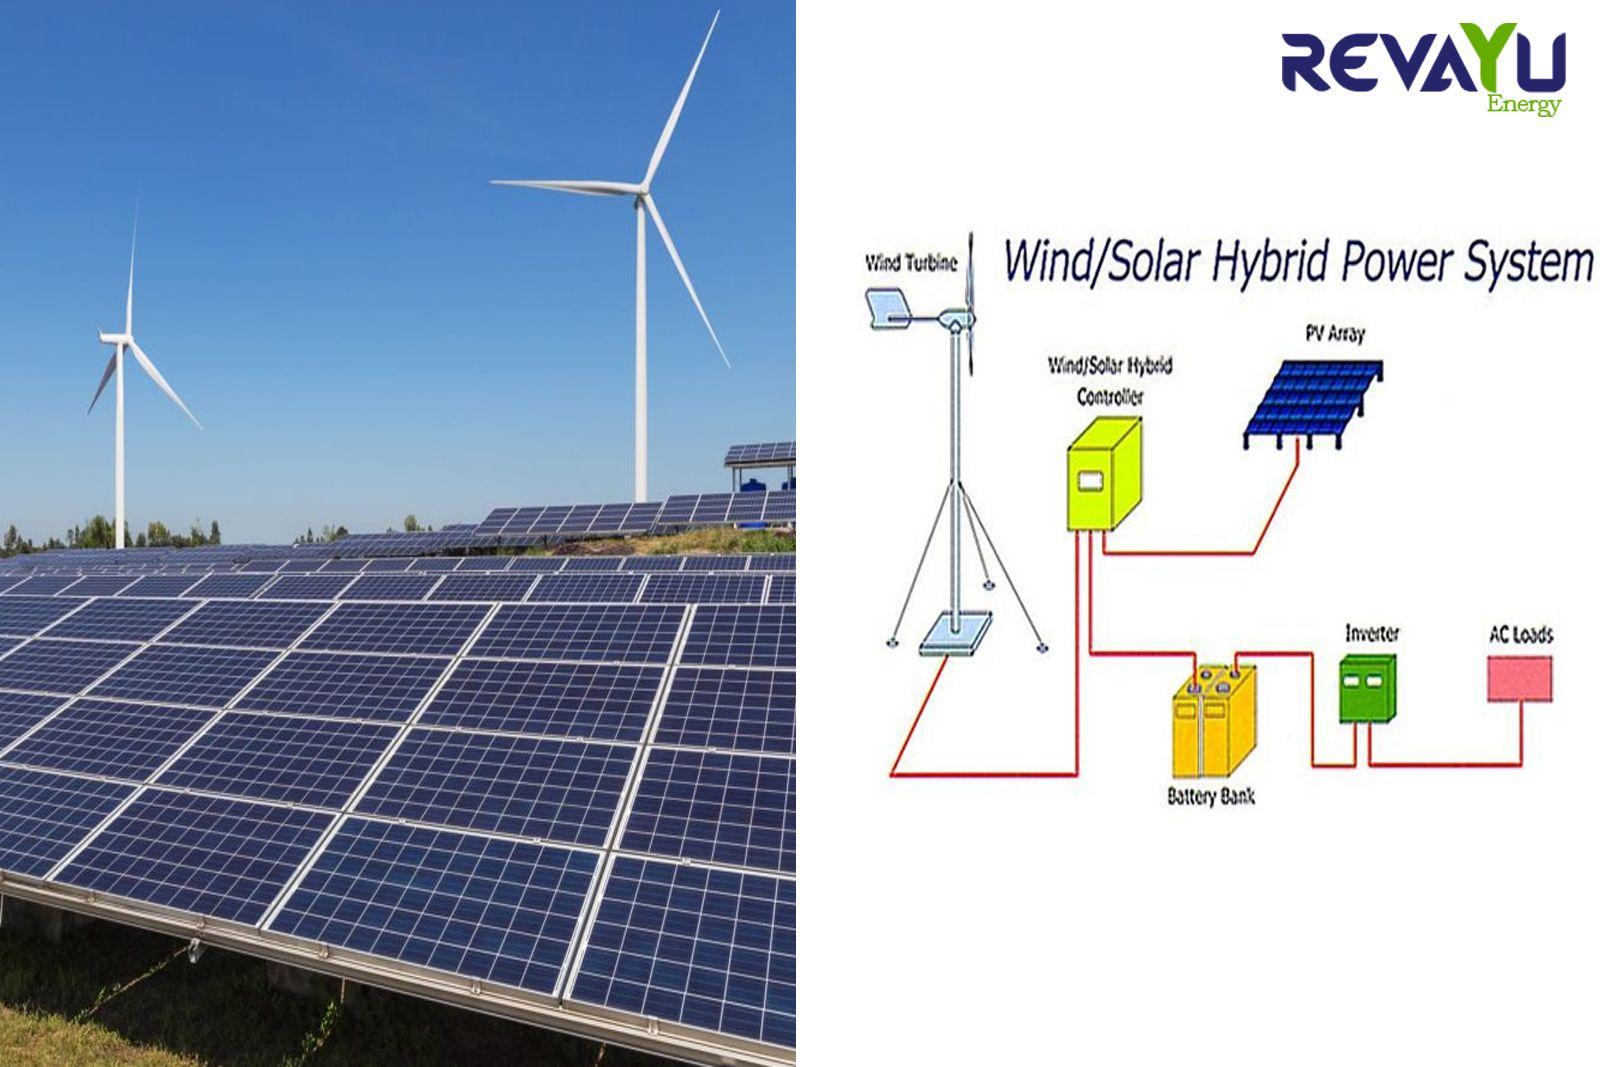 Hybrid Energy In India With Solar Wind Power Revayu Energy Renewable Energy Systems Solar Solar Wind